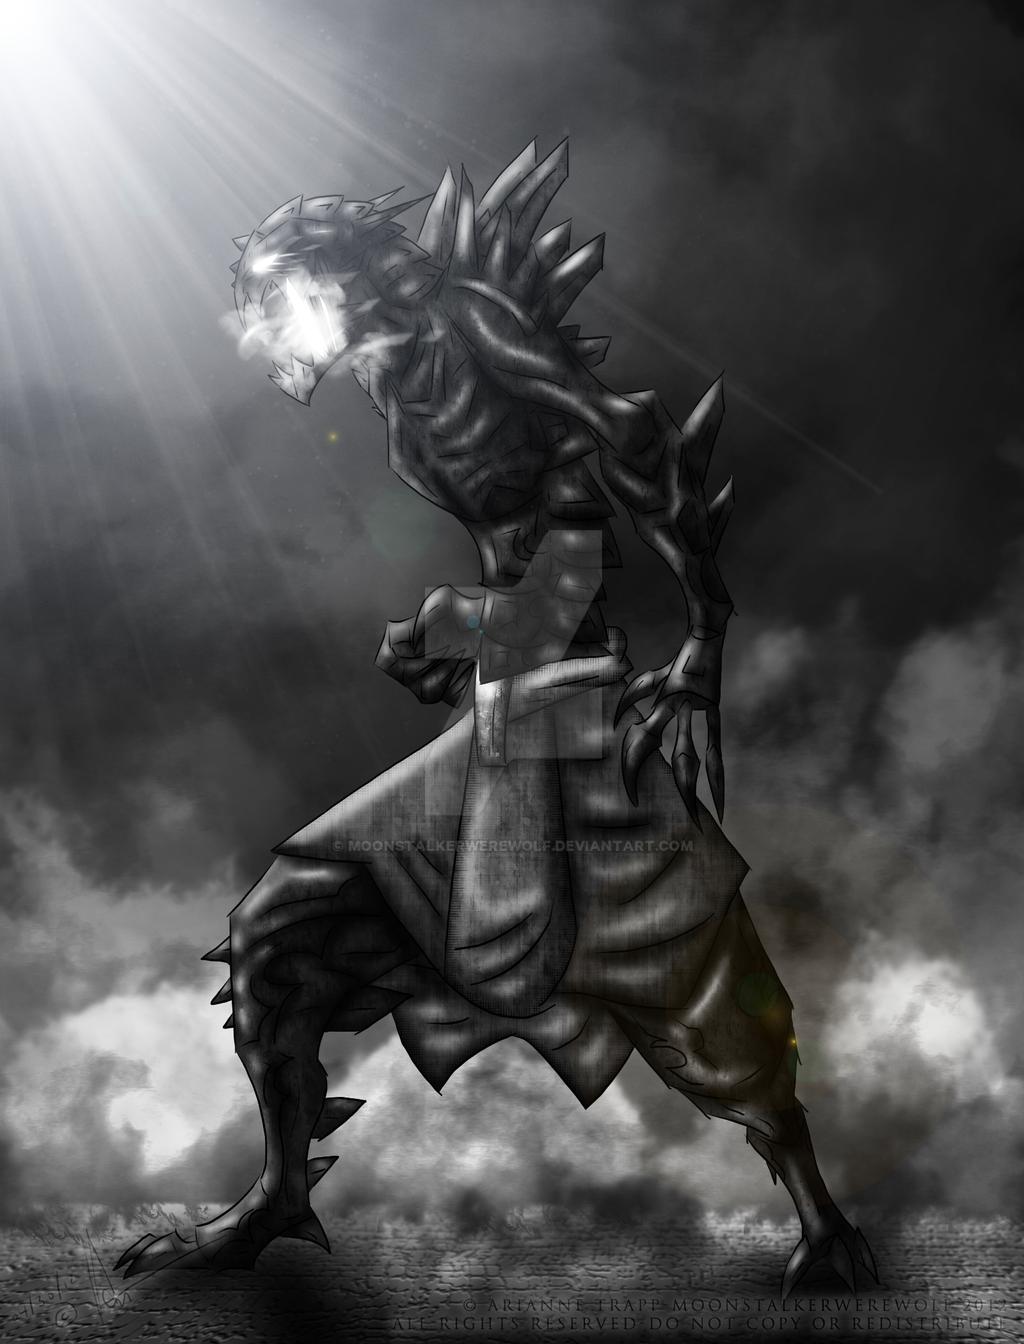 Armor Demon Sentry by MoonstalkerWerewolf